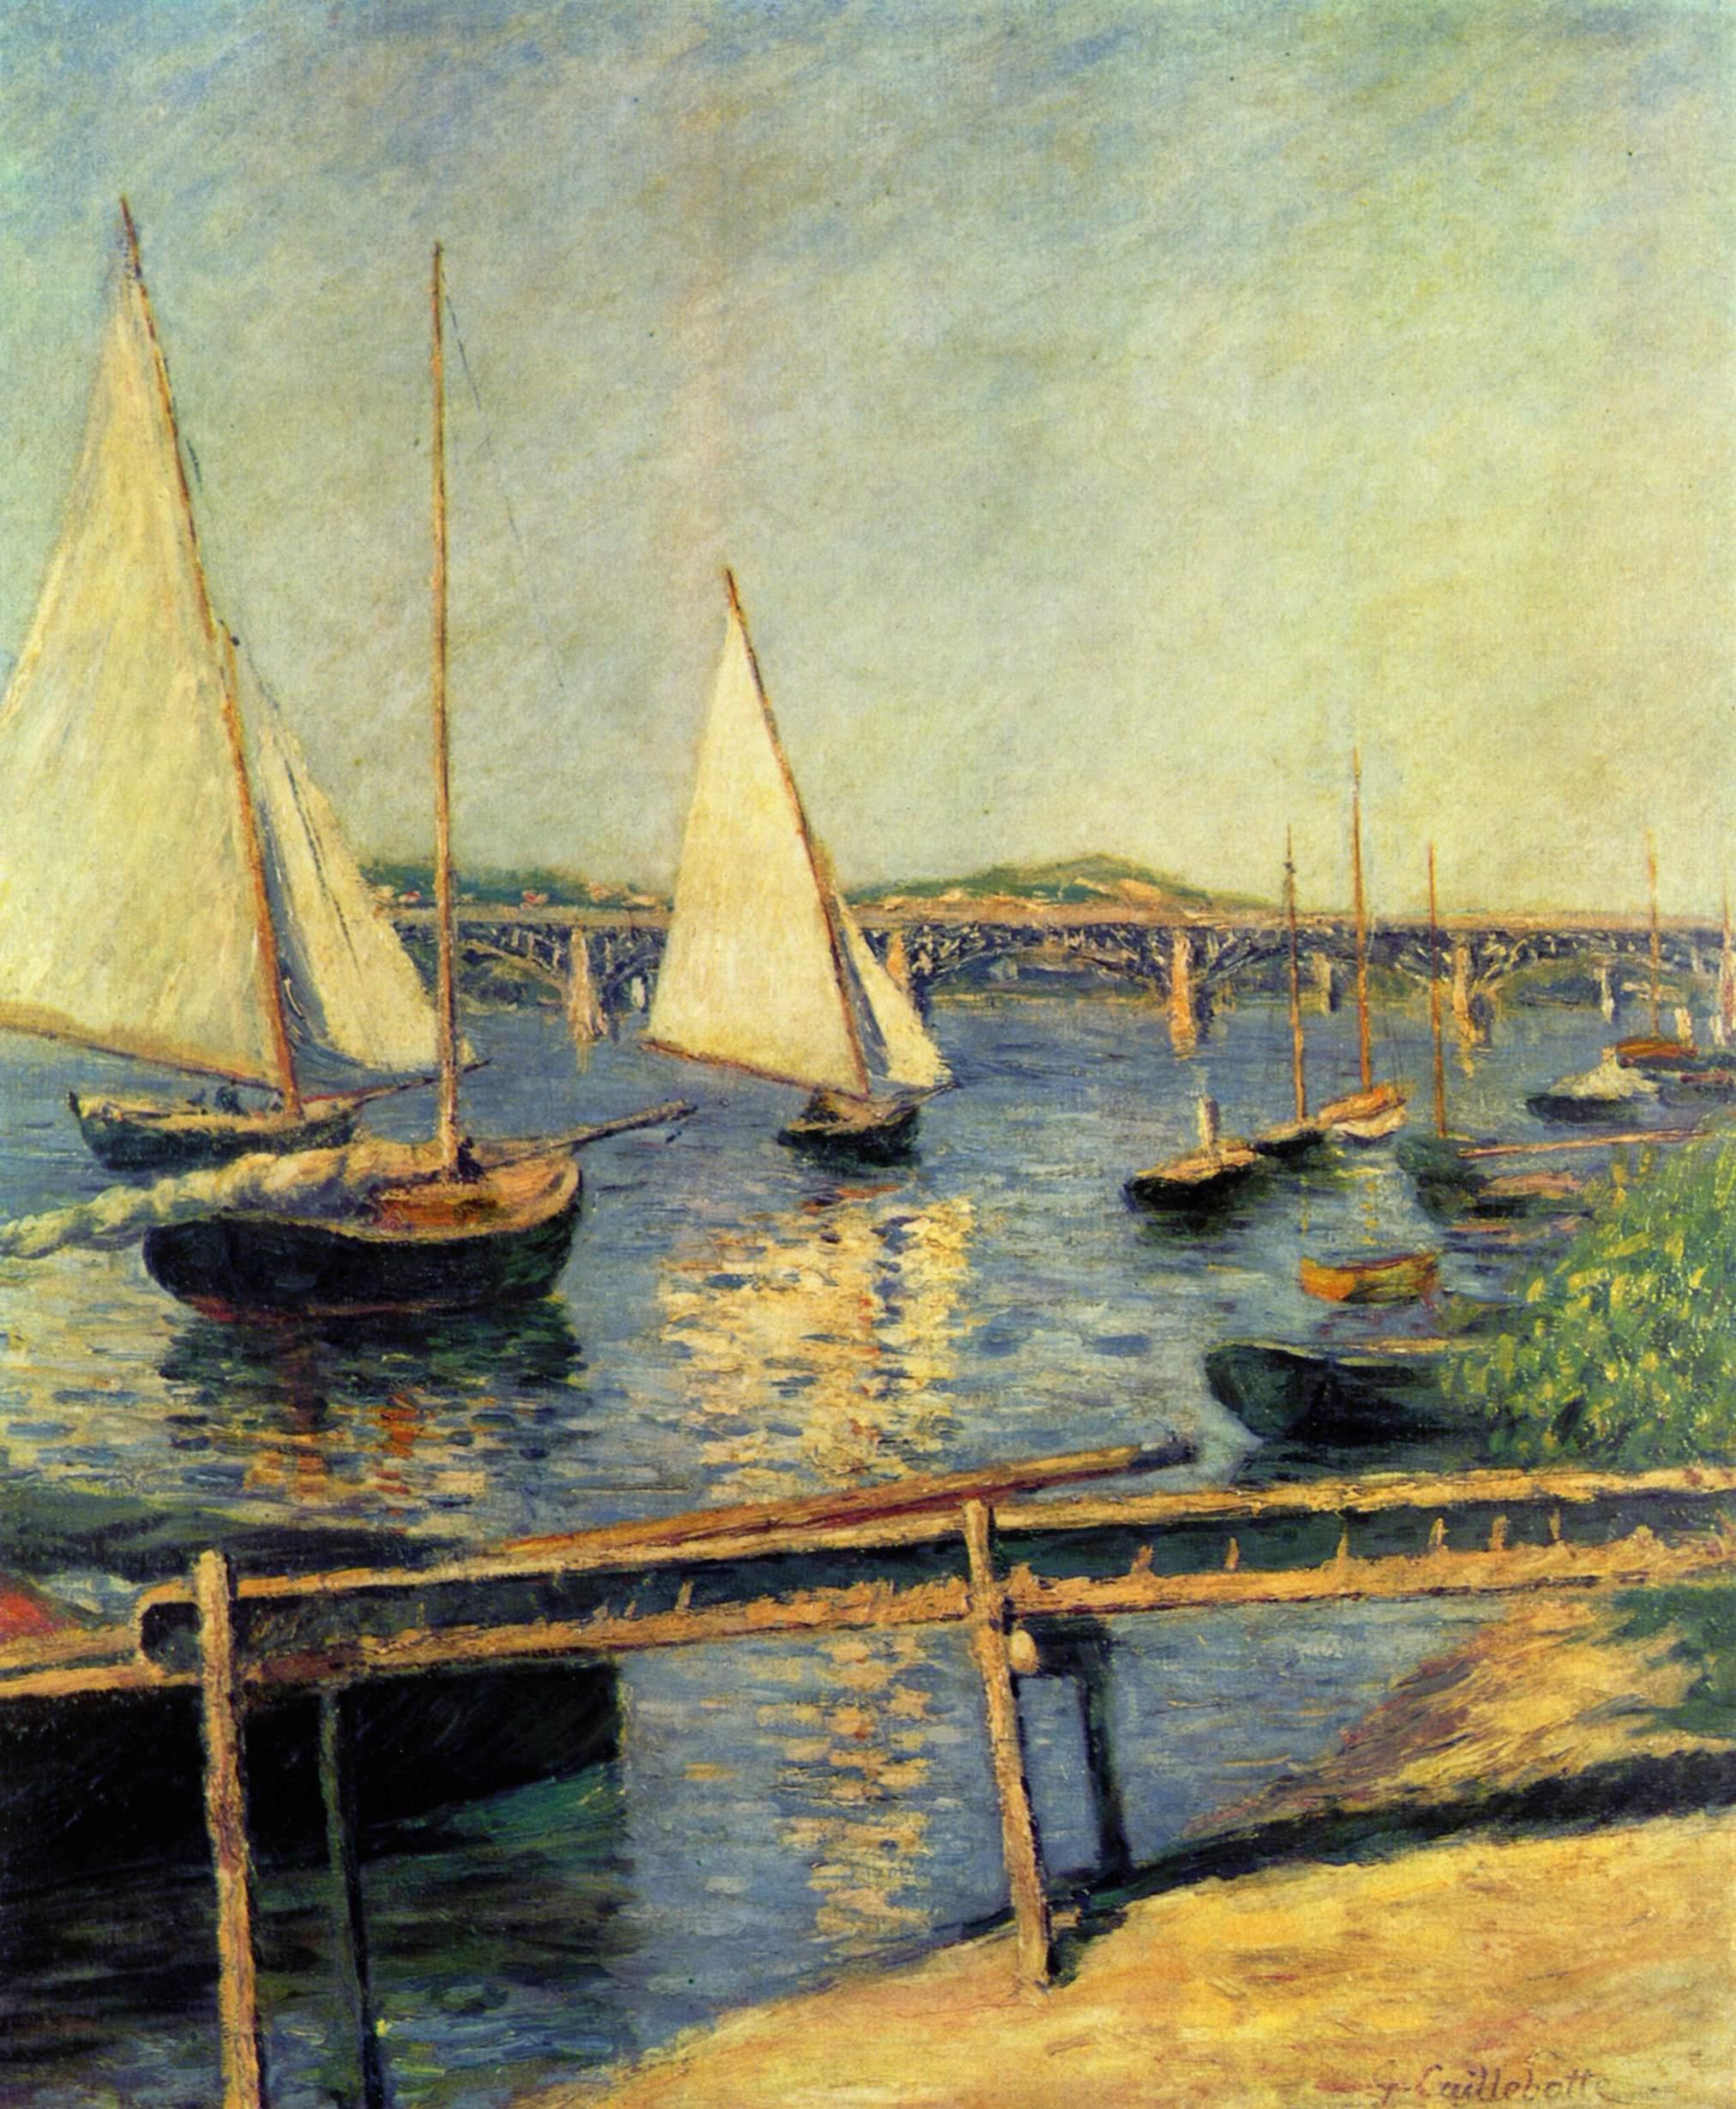 Sailing boats at Argenteuil, 1888